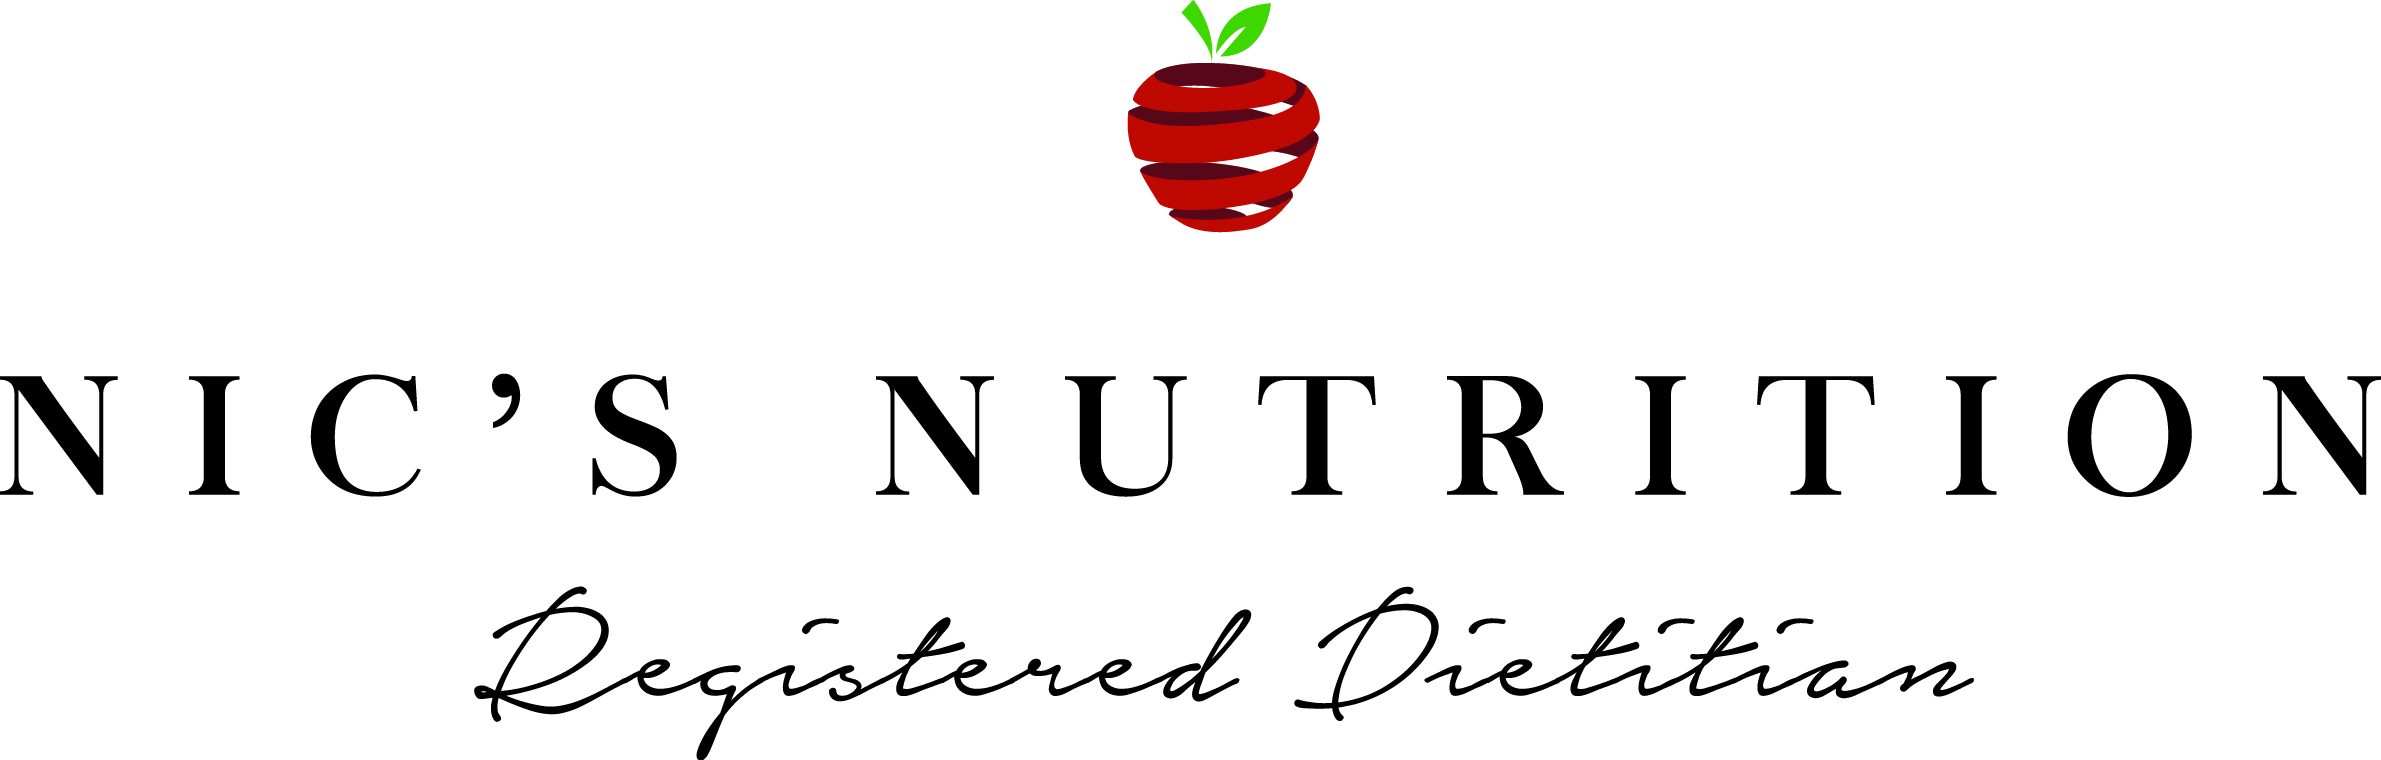 nics nutriotion header image.jpg